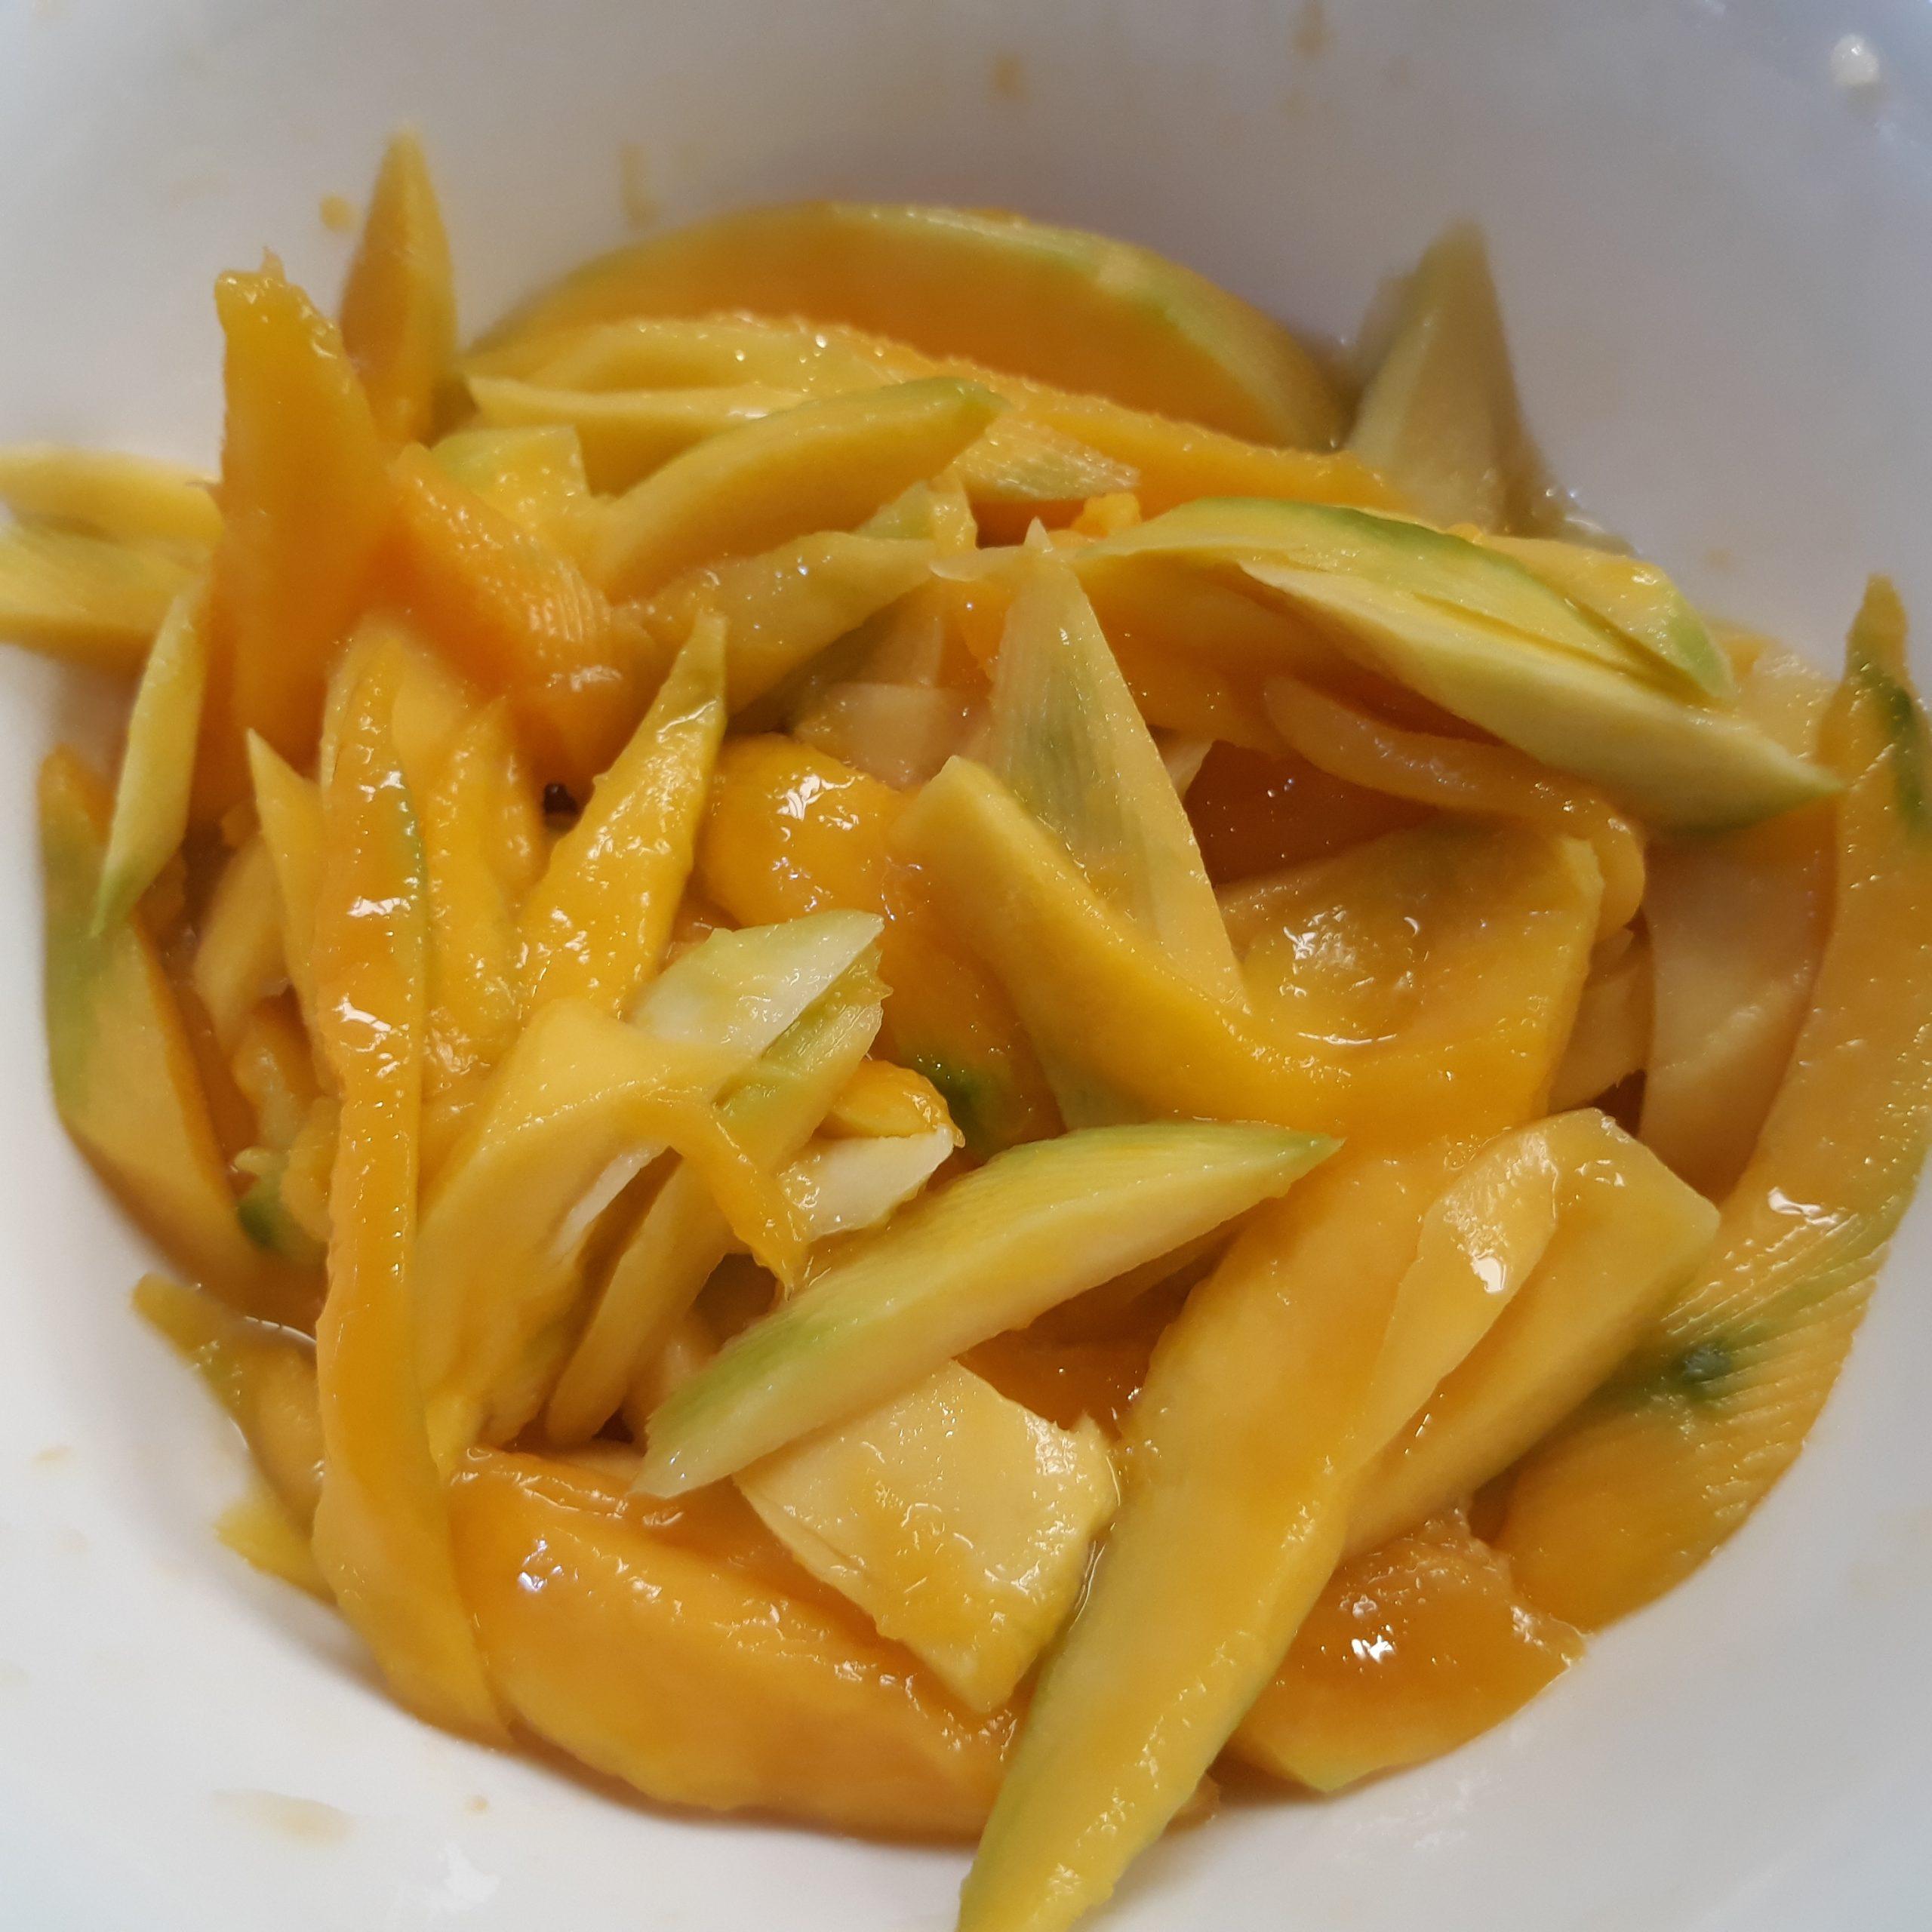 Slices of Indian Mango